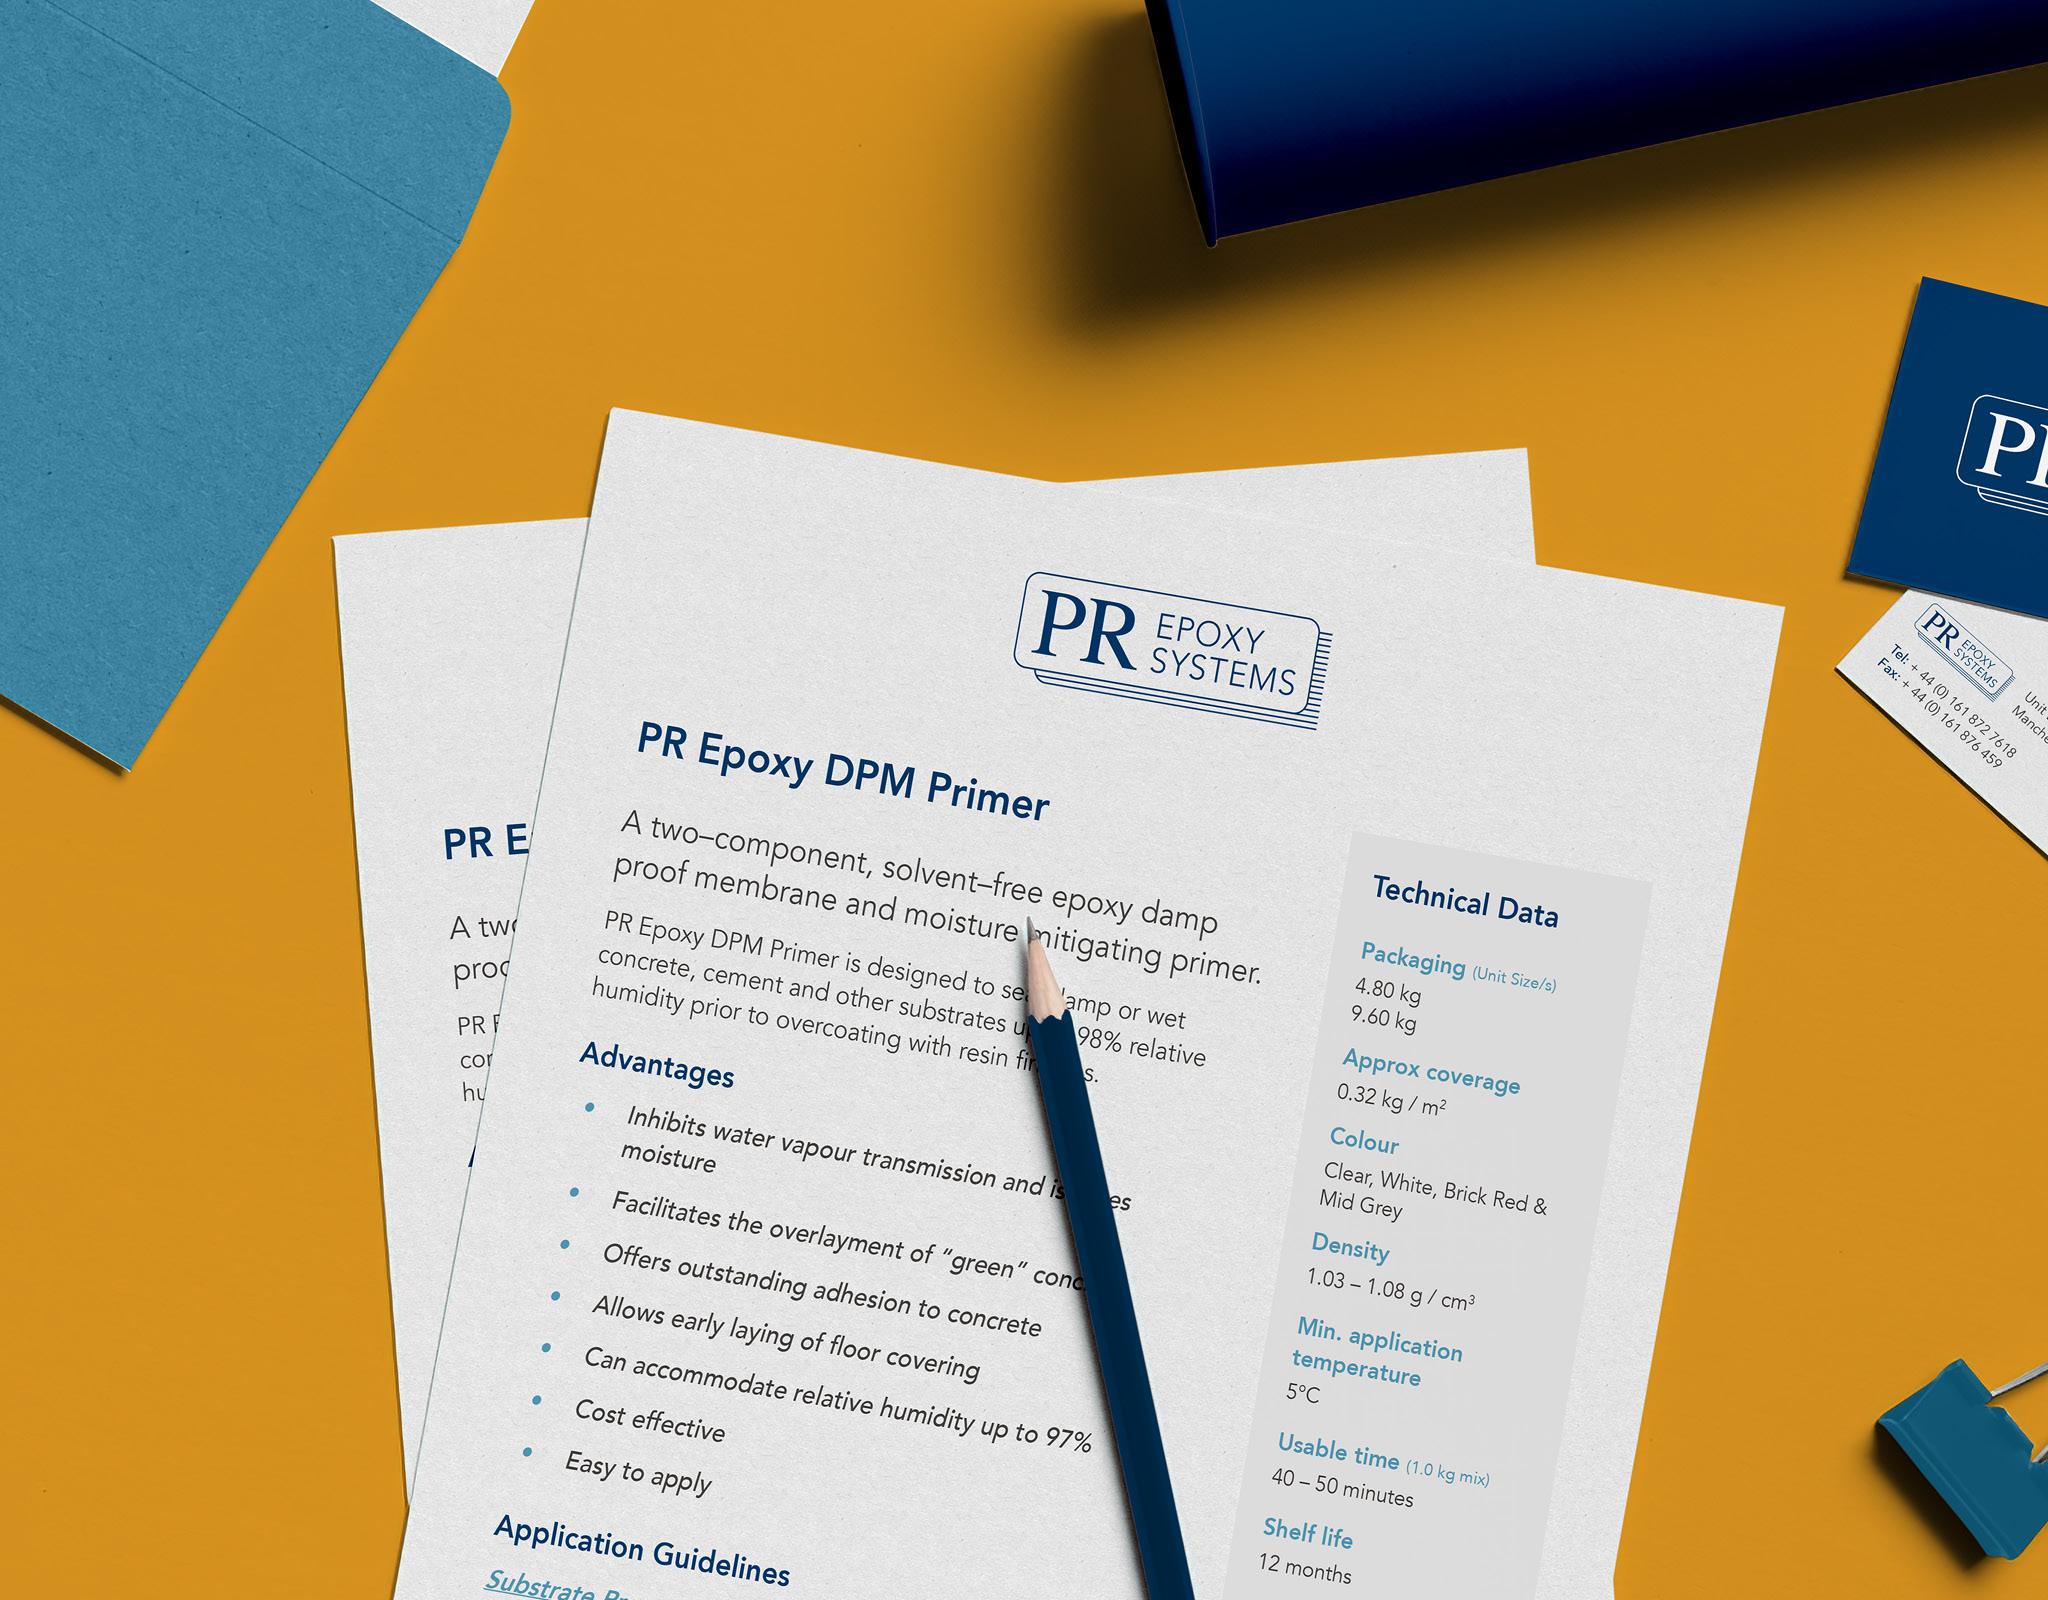 PR Epoxy - New Look Technical Data for New Look Website